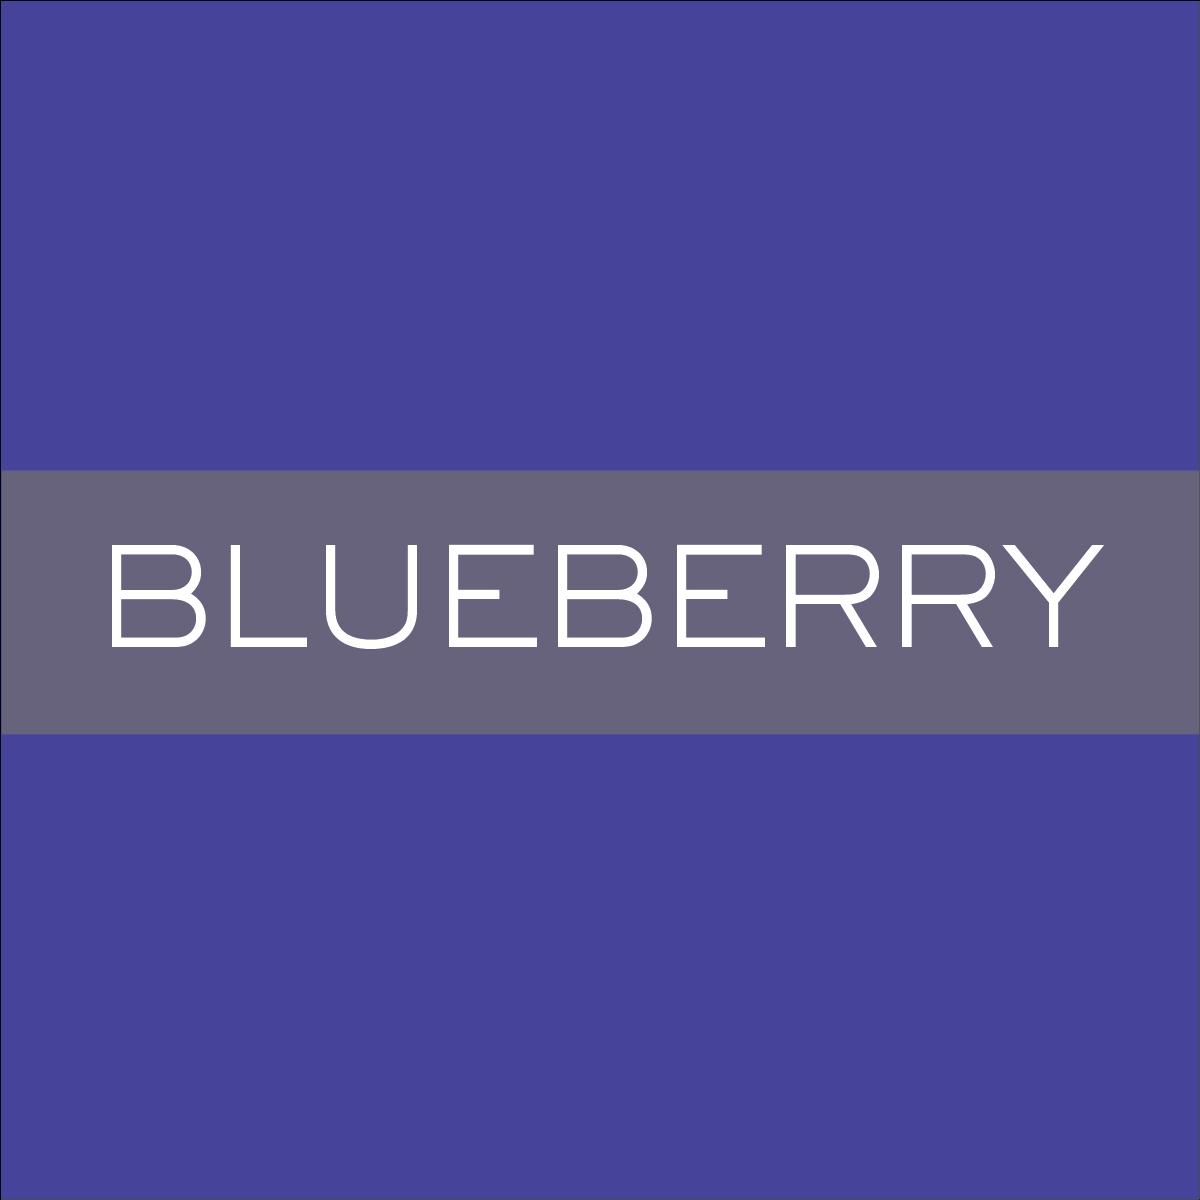 INK_Blueberry.jpg